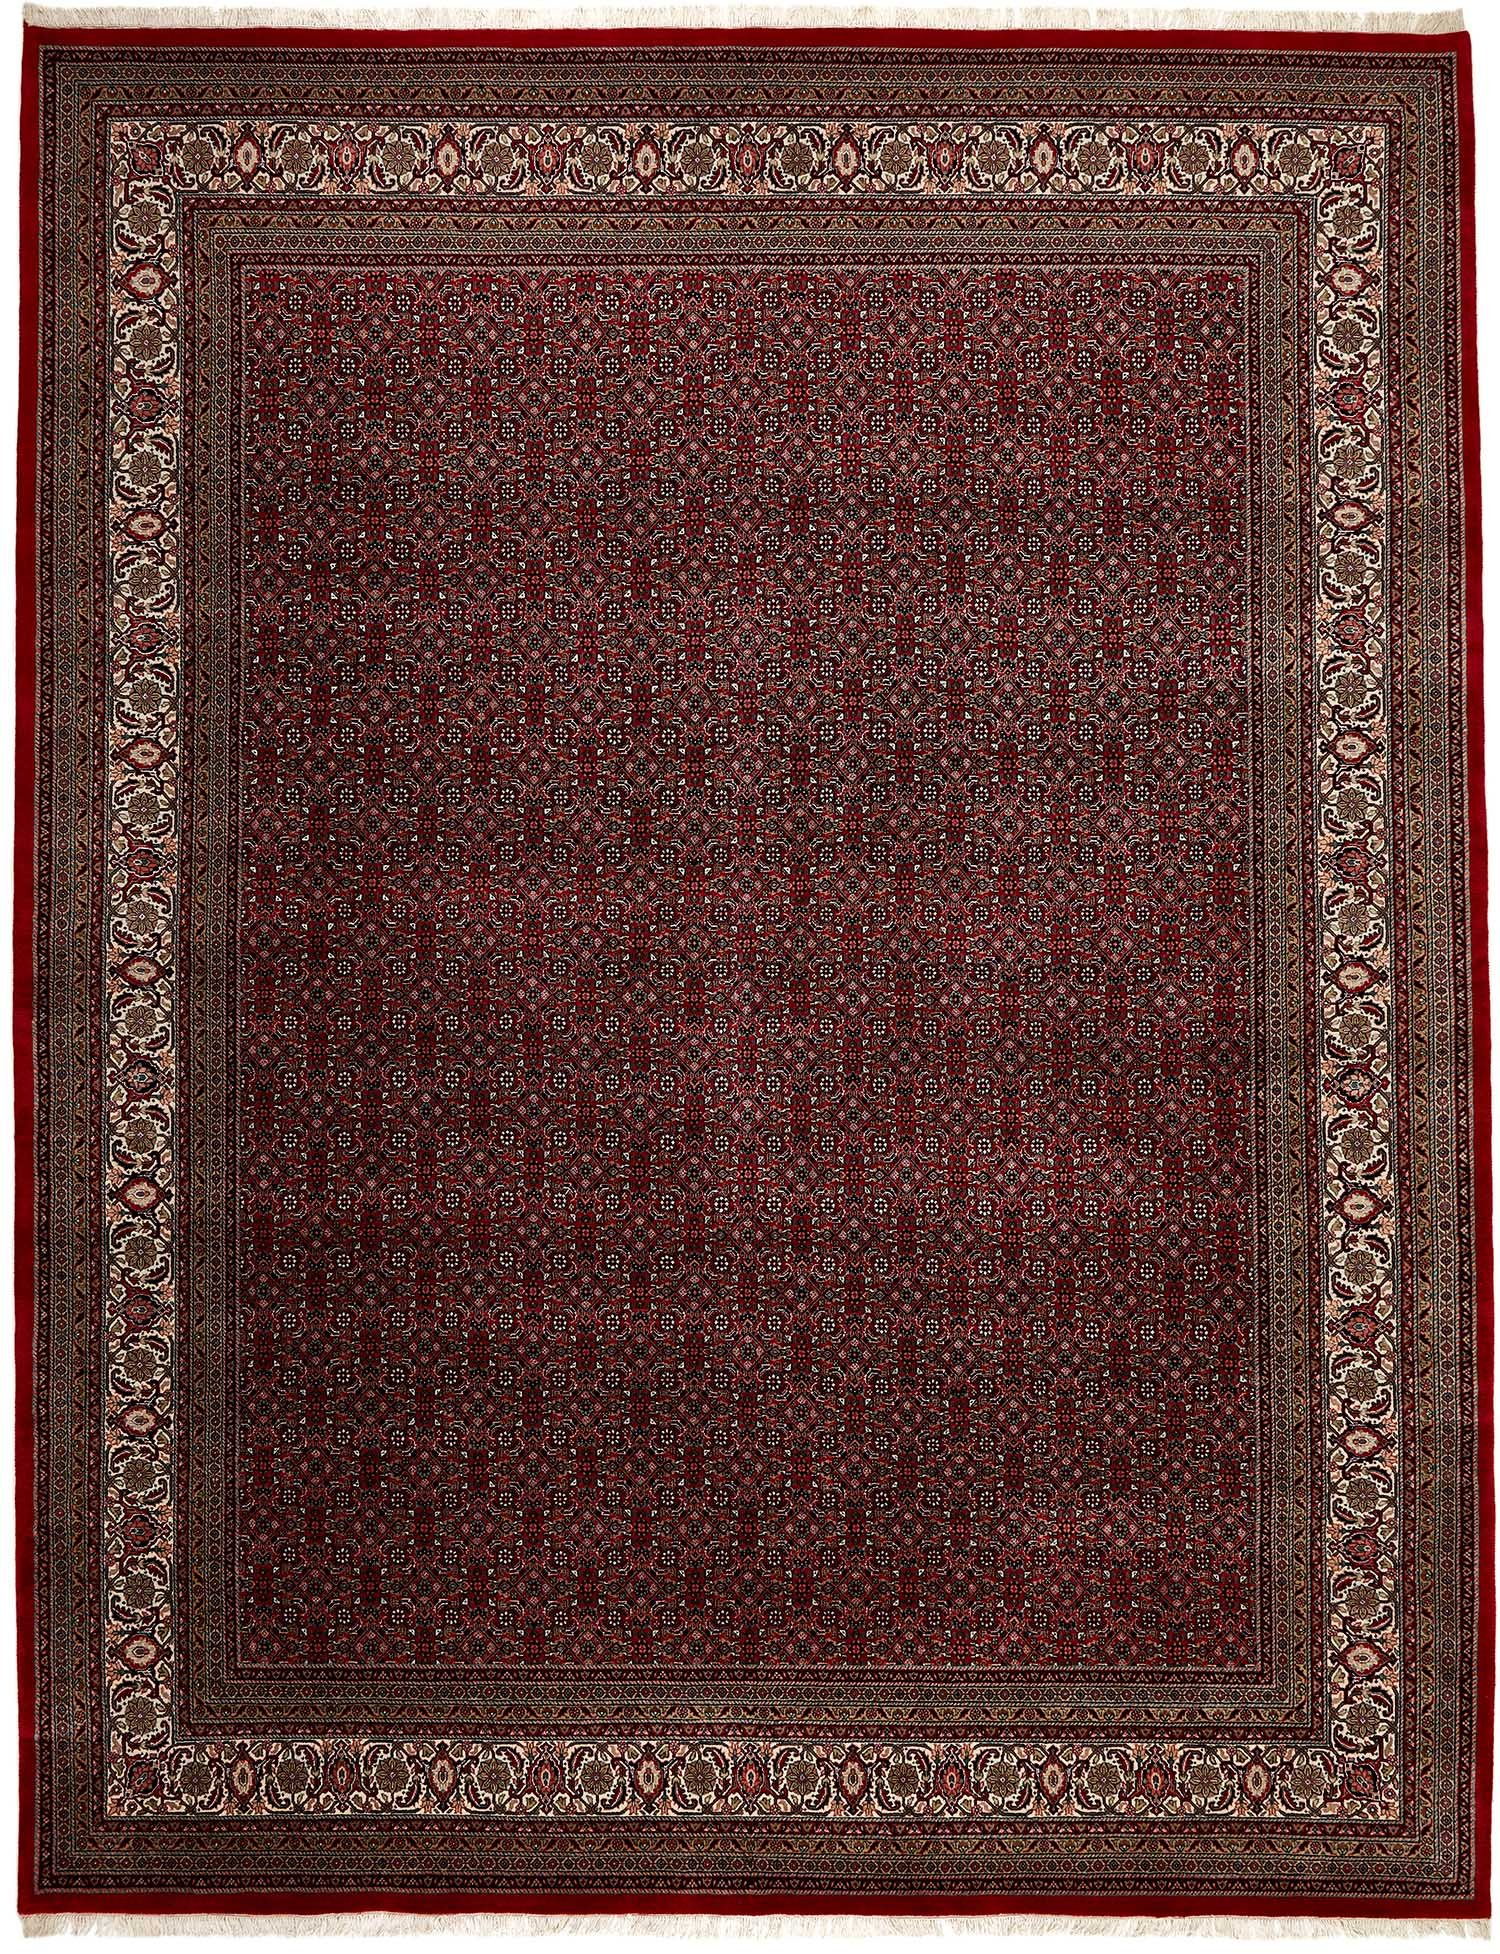 Indien Bidjar Royal 300x400 1175851